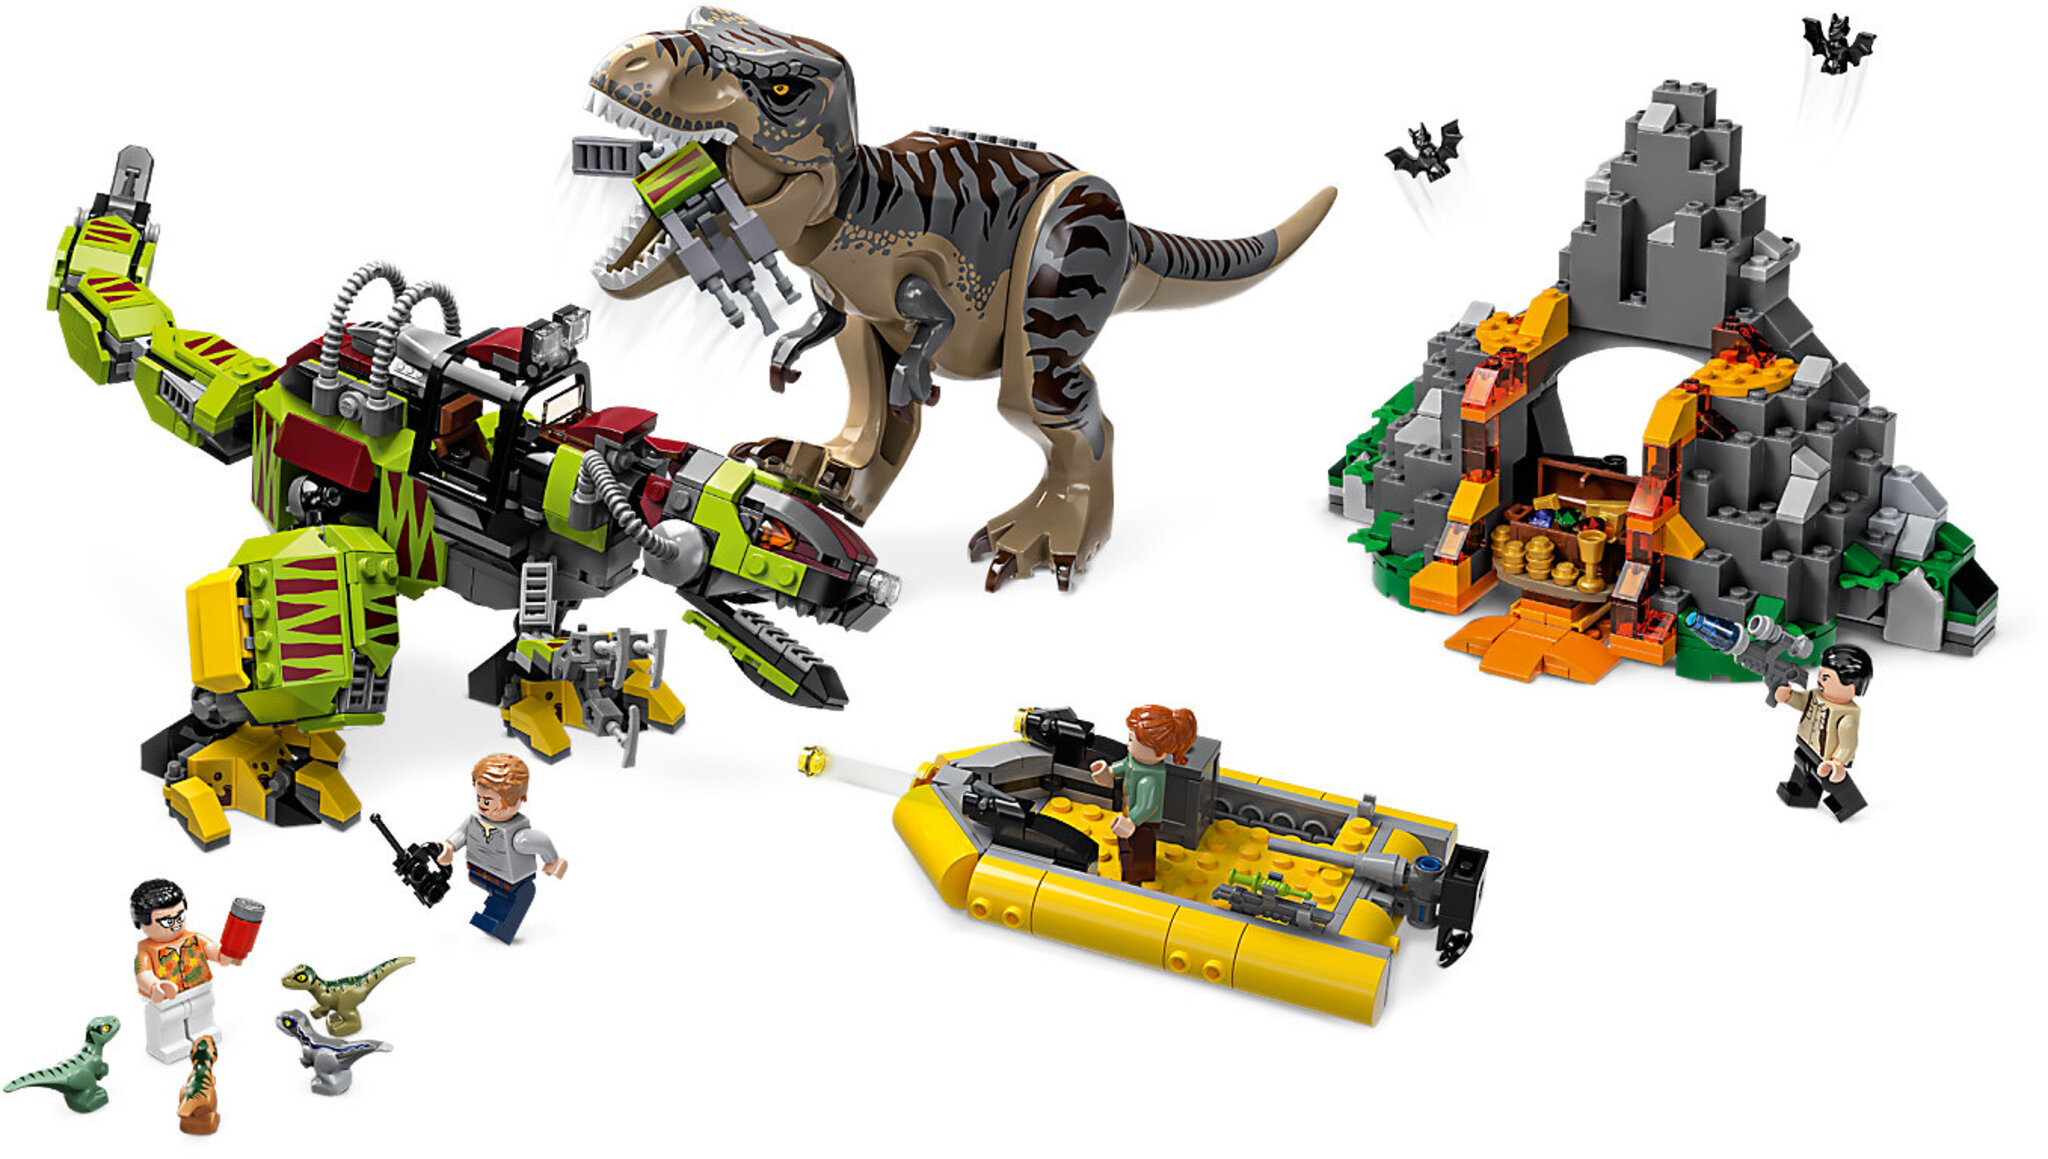 LEGO Jurassic World 75938 - T  Rex Vs Dino Mech Battle